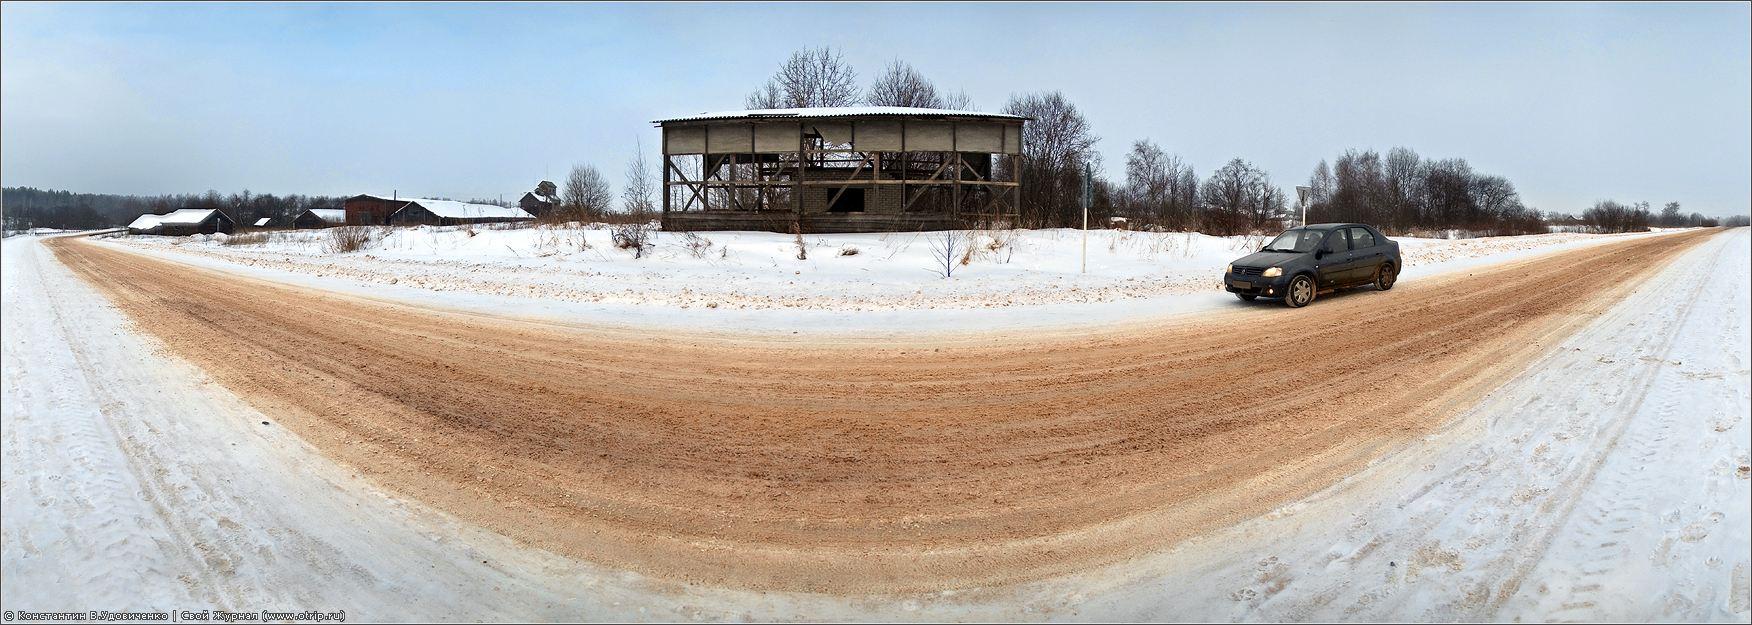 7133-10320x3118s_2.jpg - Logan, фотосессия в полях (14.02.2010)